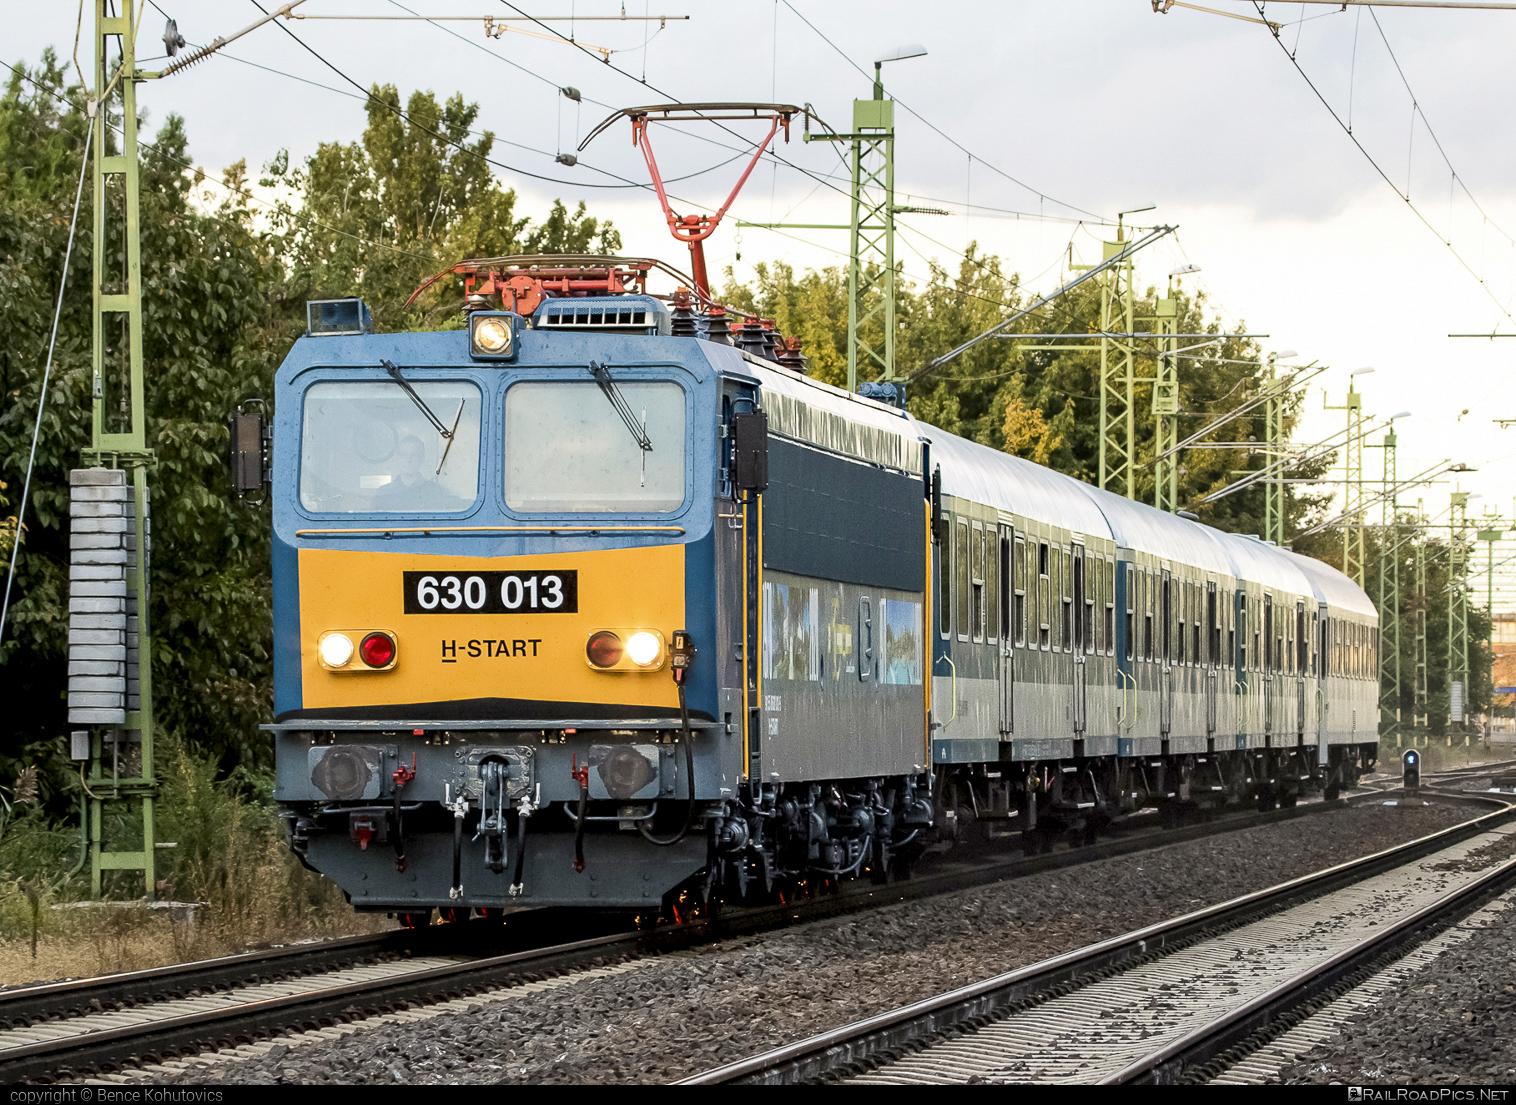 Ganz-MÁVAG VM15-3 - 630 013 operated by MÁV-START ZRt. #ganz63 #ganz630 #ganzmavag #ganzmavag63 #ganzmavag630 #ganzmavagvm153 #locomotive630 #mav #mavstart #mavstartzrt #v63locomotive